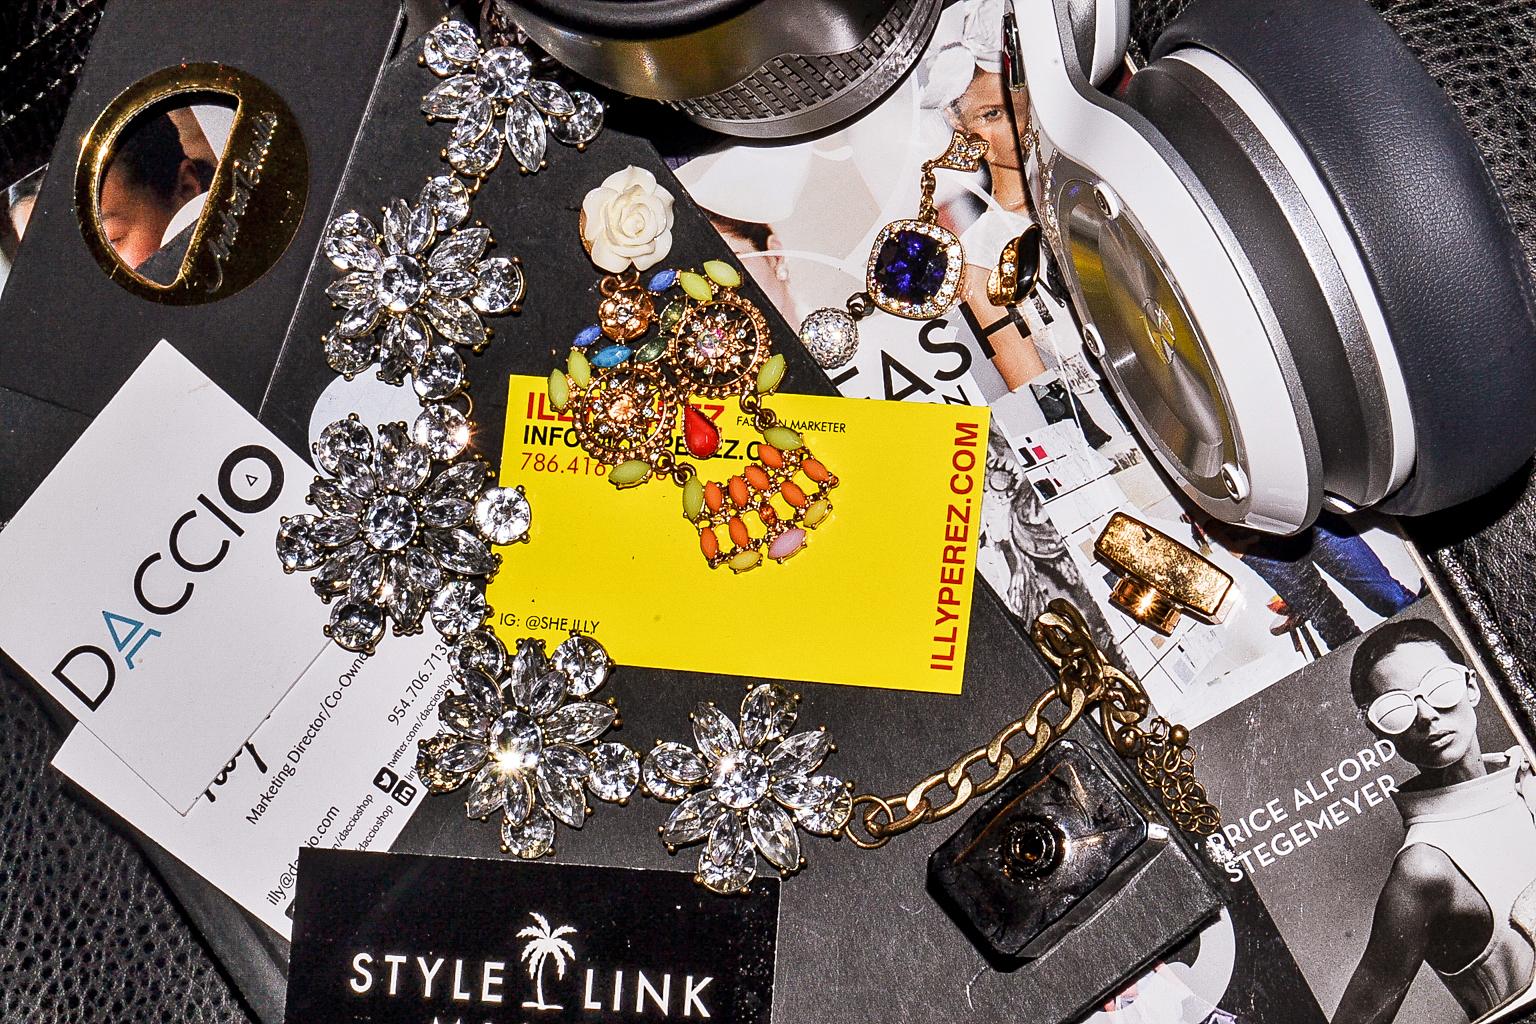 miami-fashion-stylist-photograoher-blogger-illy-perez-online-website-1